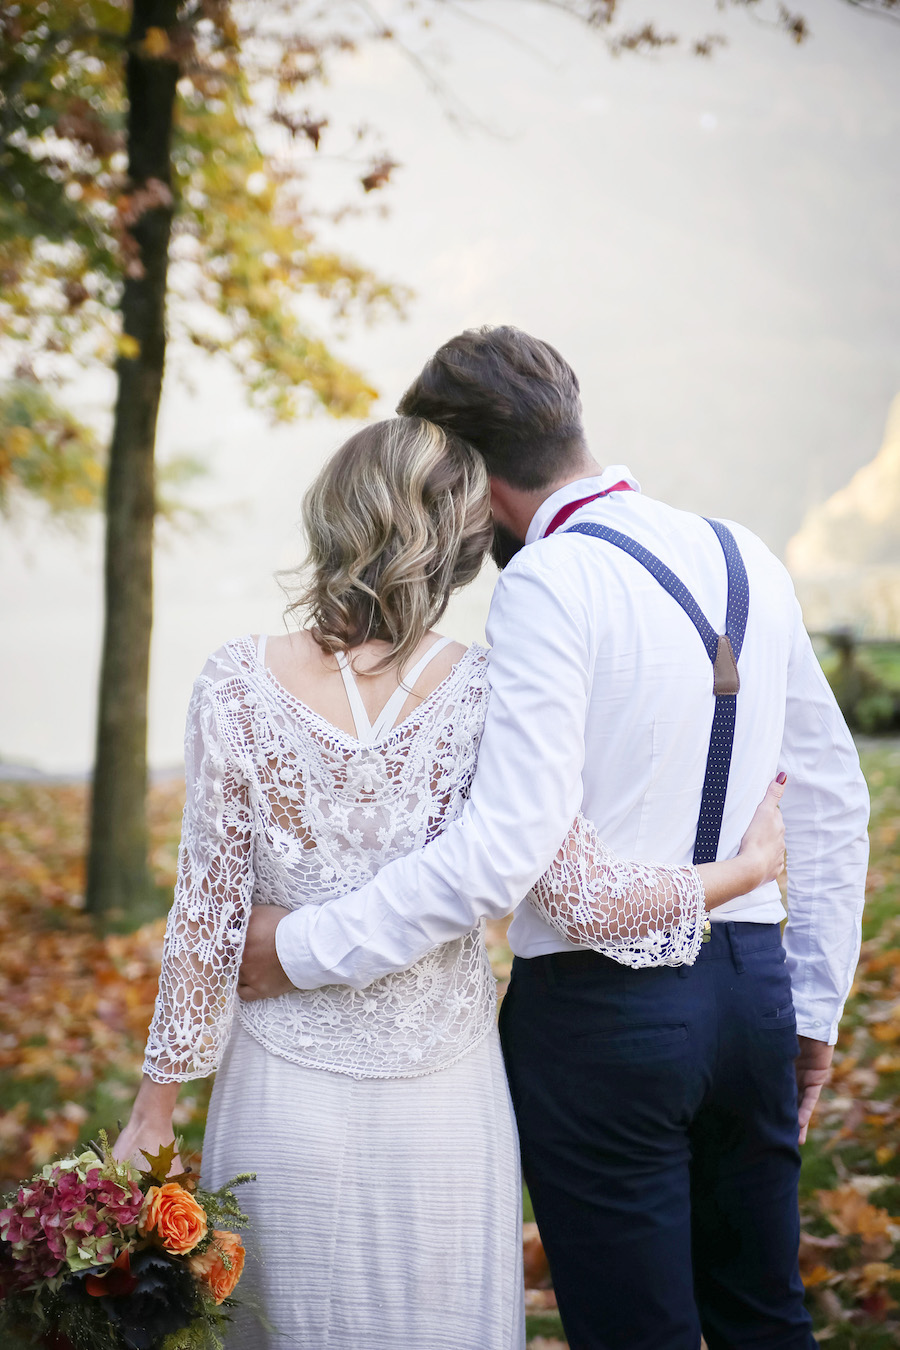 matrimonio-in-autunno-fil-blanc-17